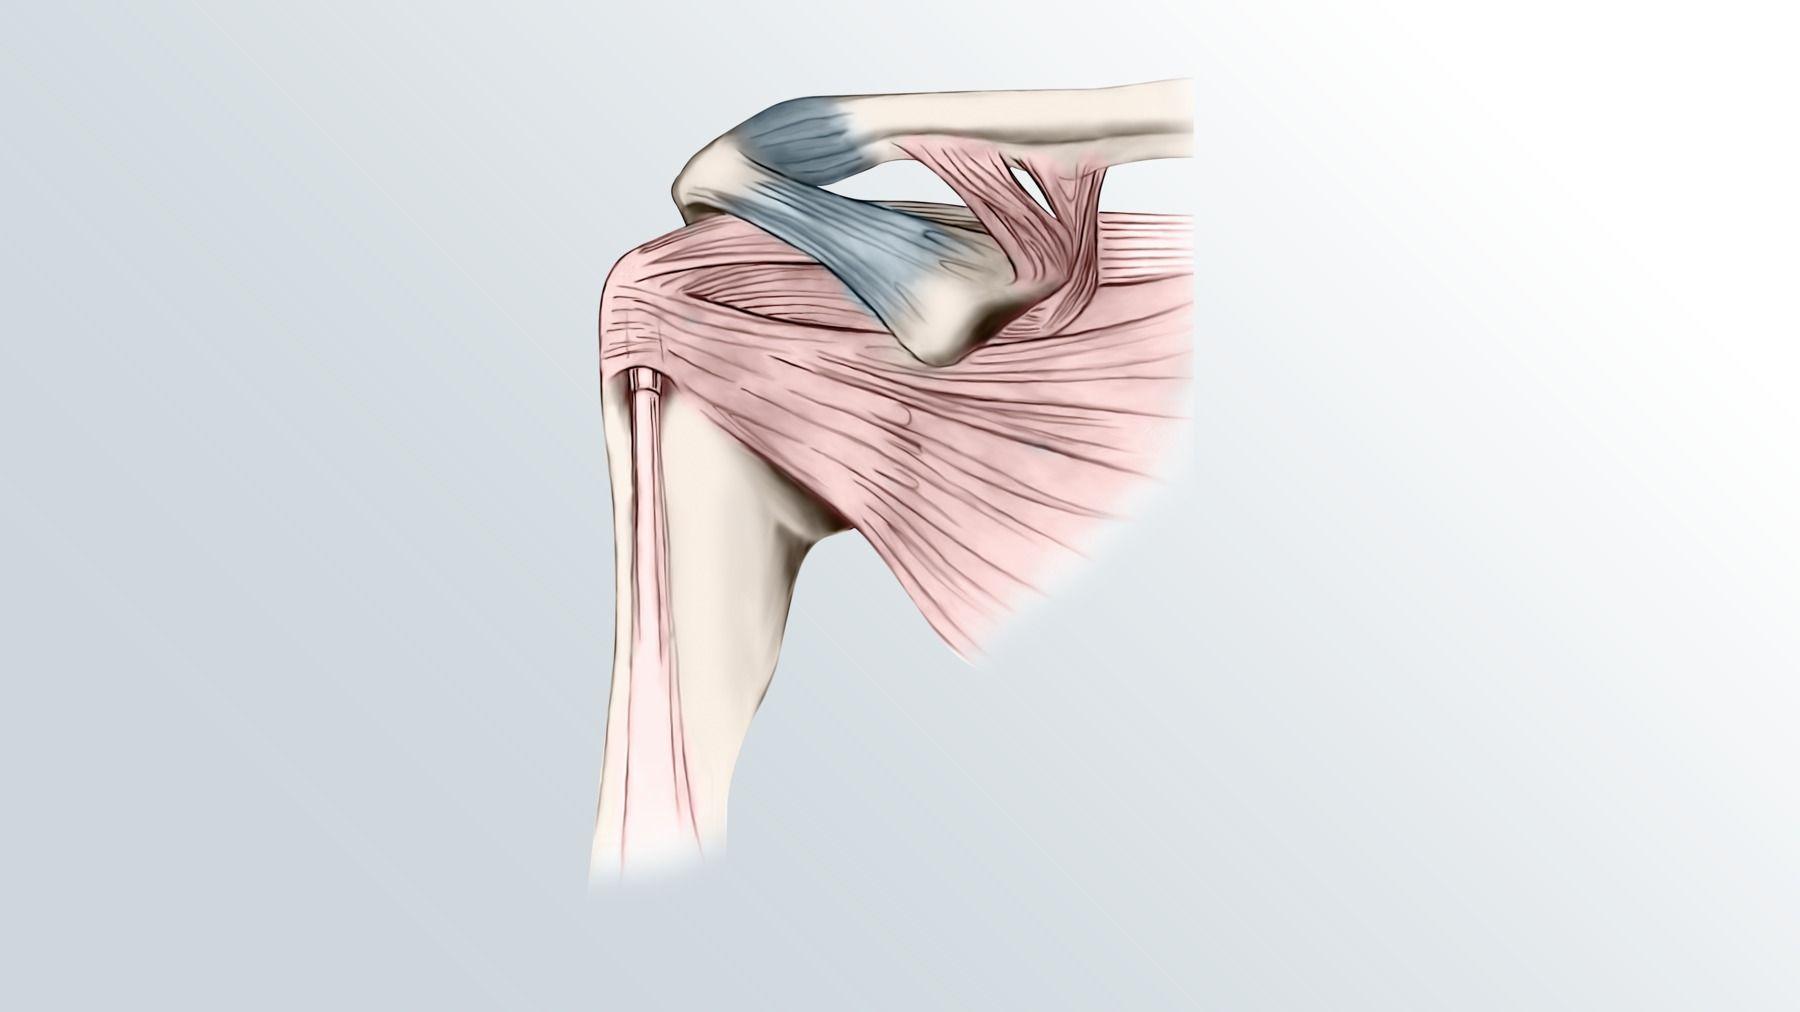 Shoulder joint anatomy -